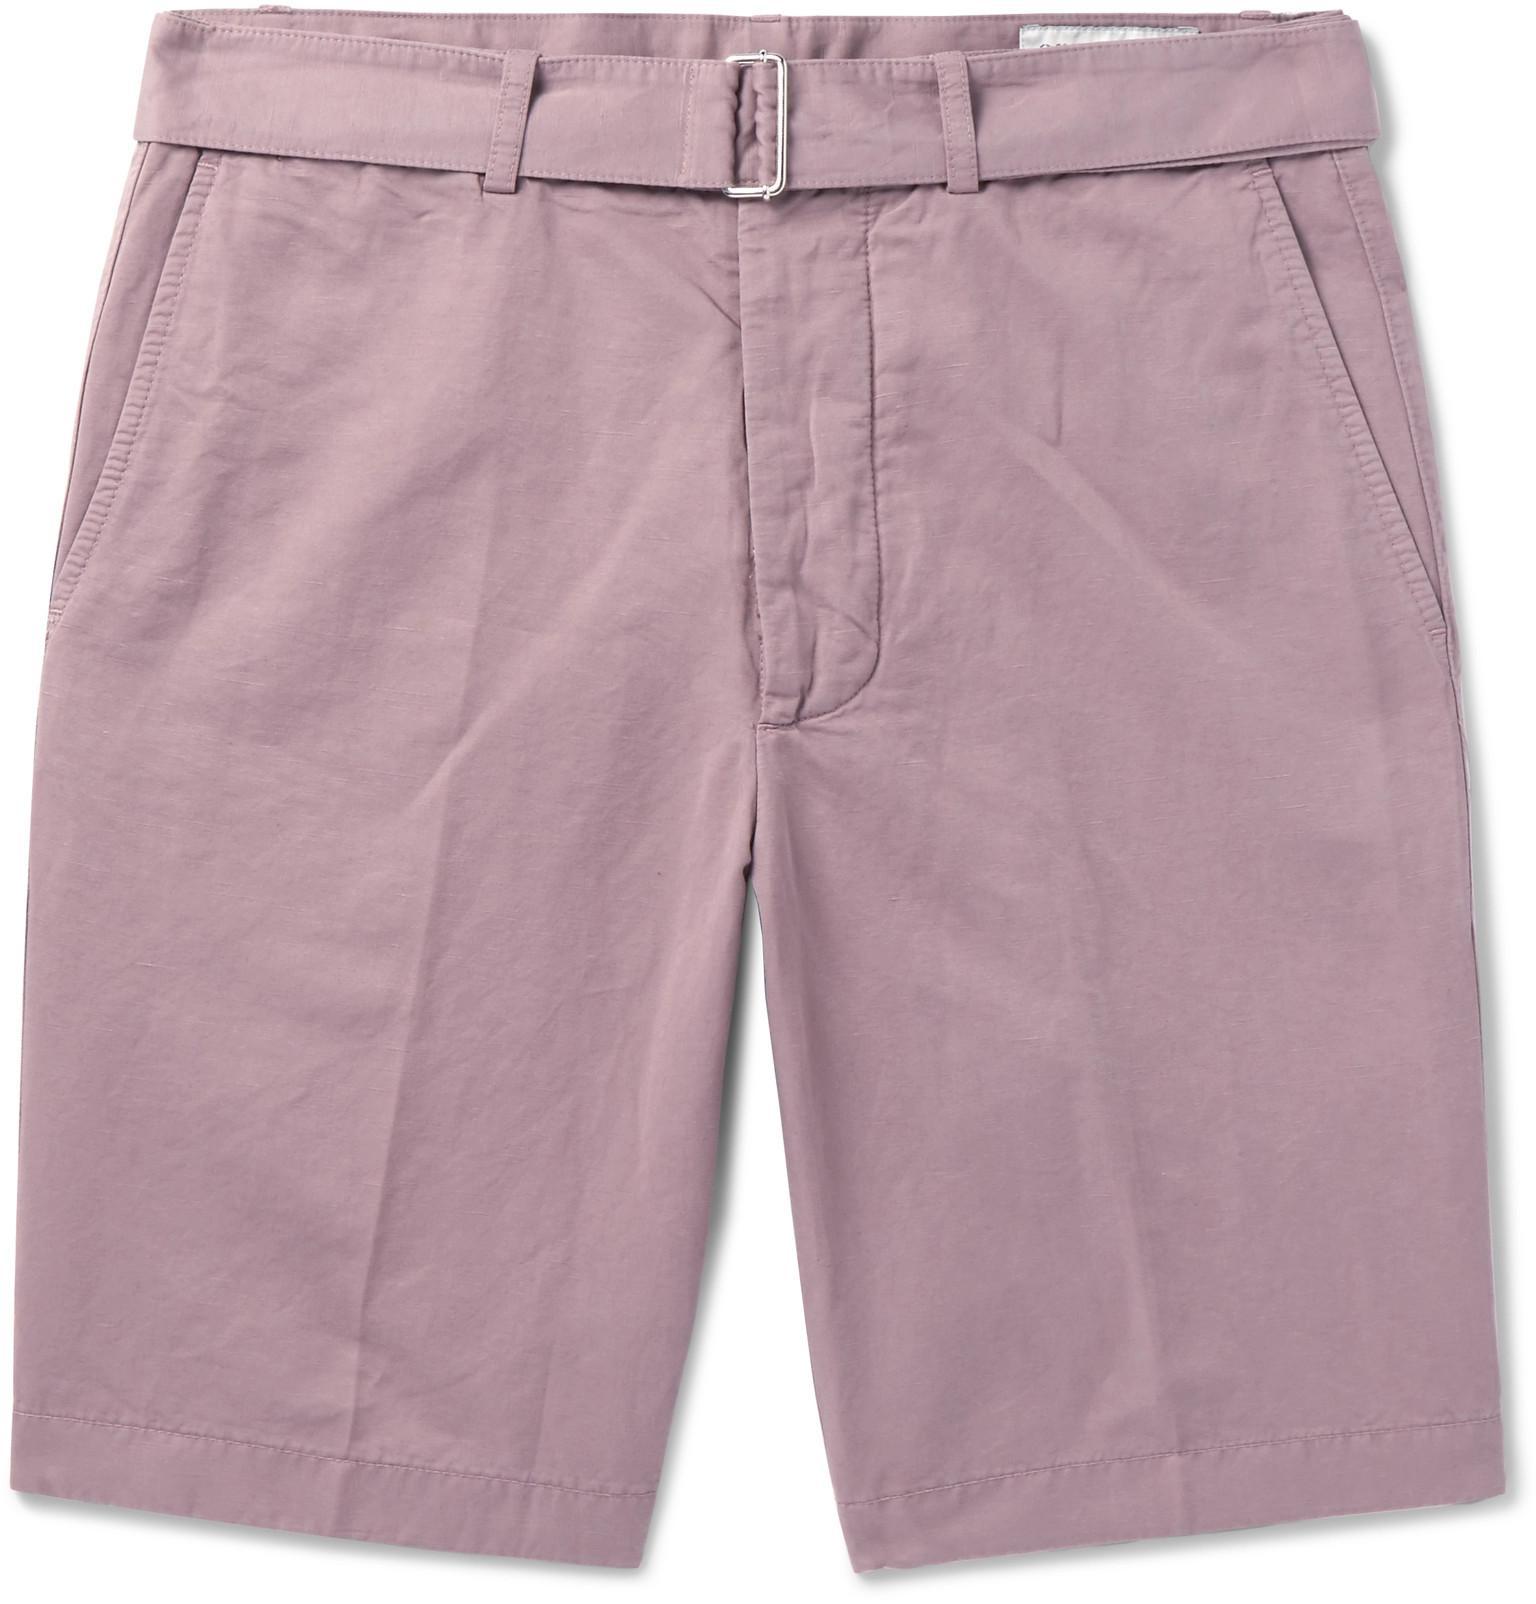 Pantalons - Bermudas Officine Generale ddUcmRB